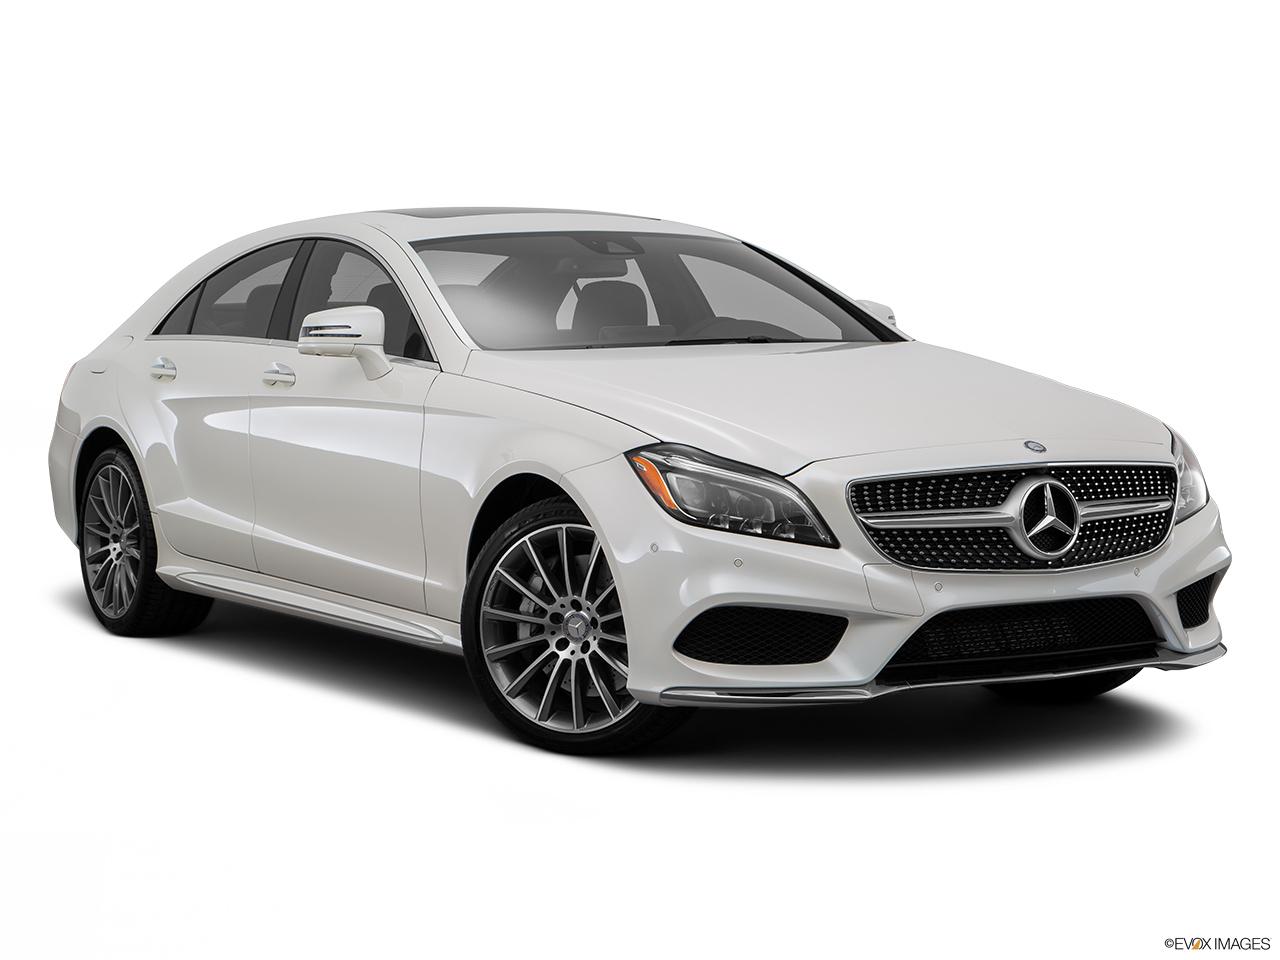 Car pictures list for mercedes benz cls class 2016 cls 500 for Mercedes benz payment estimator